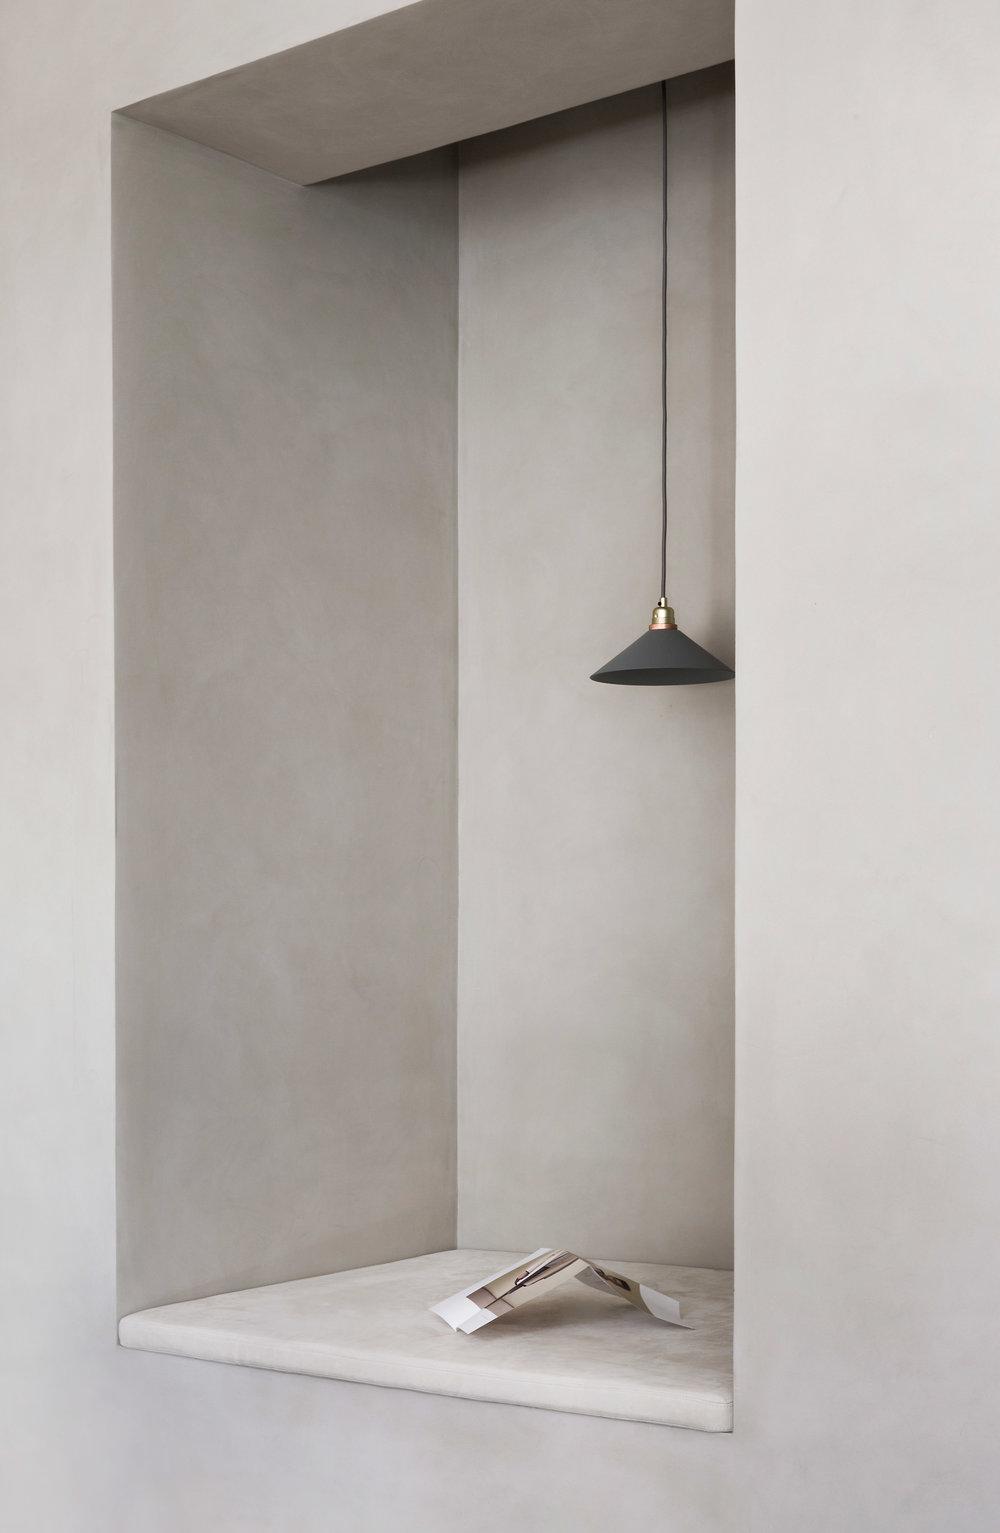 kinfolk-office_norm_architects_interiors_gallery_copenhagen_dezeen_2364_col_1.jpg